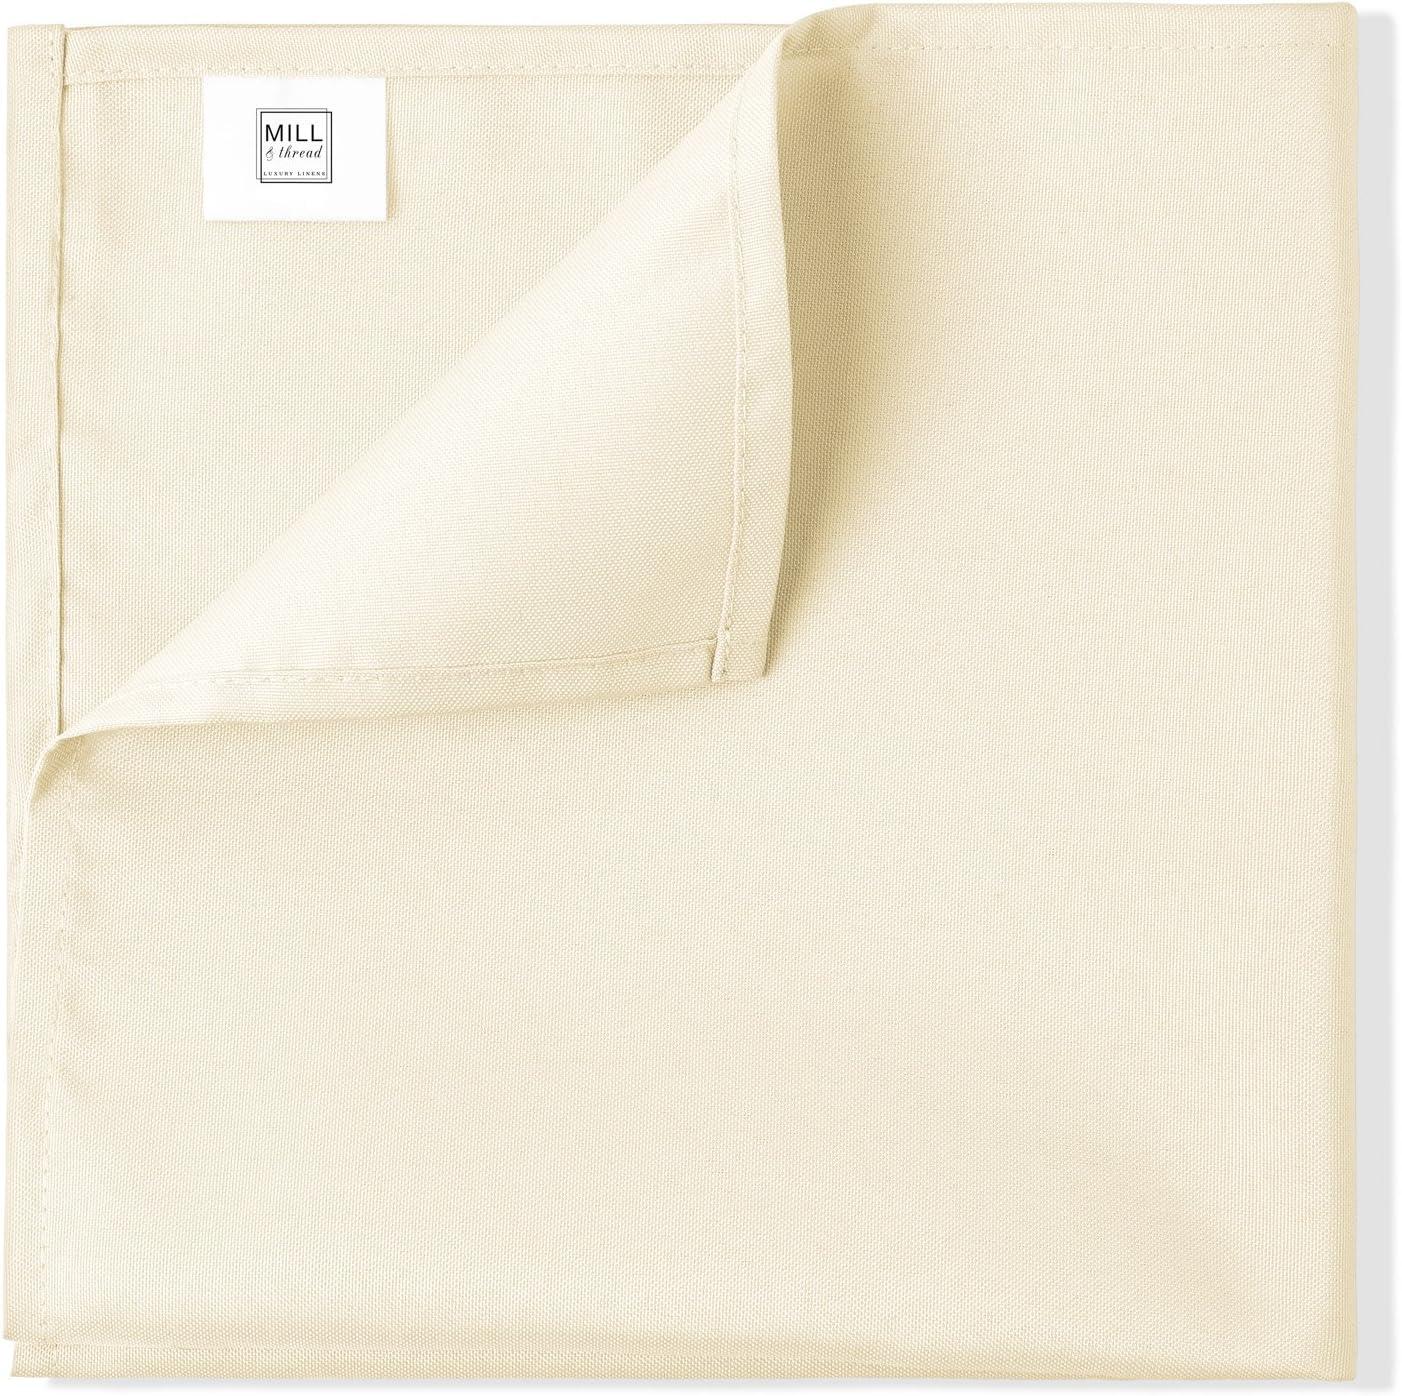 1 Dozen 20 Oversized Cloth Dinner Table Napkins White Machine Washable Restaurant//Wedding//Hotel Quality Polyester Fabric Mill /& Thread